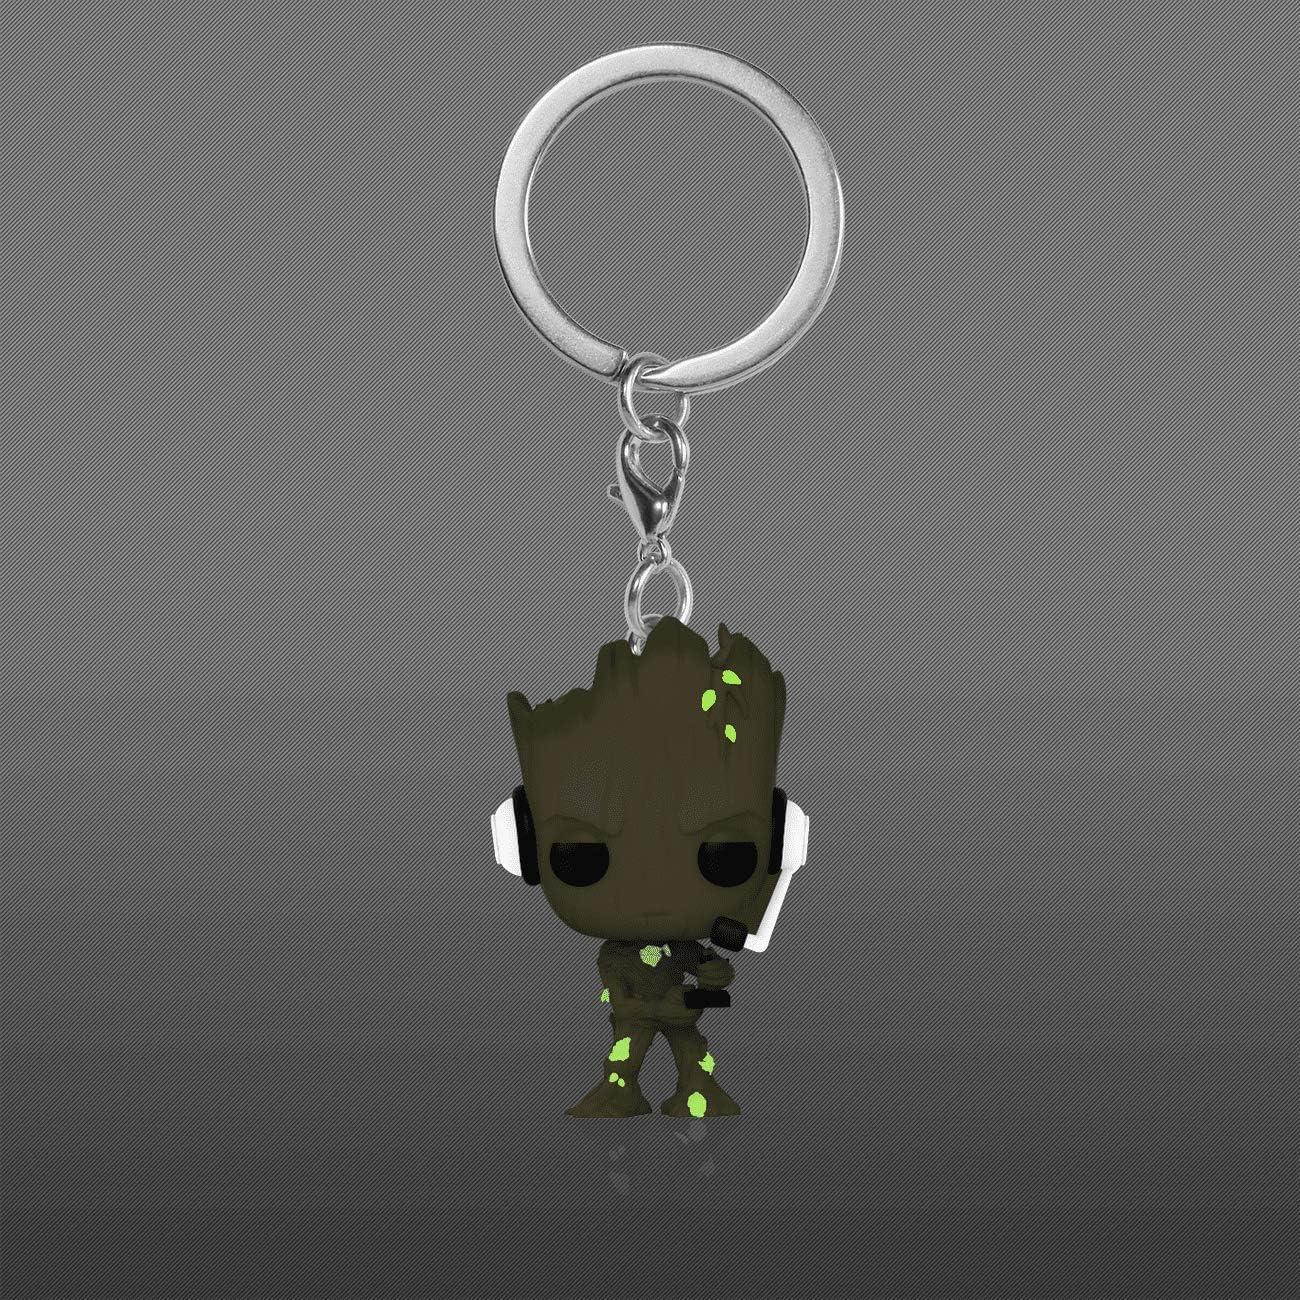 Funko Pocket Pop Keychain: Marvel Groot Gamer Glows in The Dark Exclusive